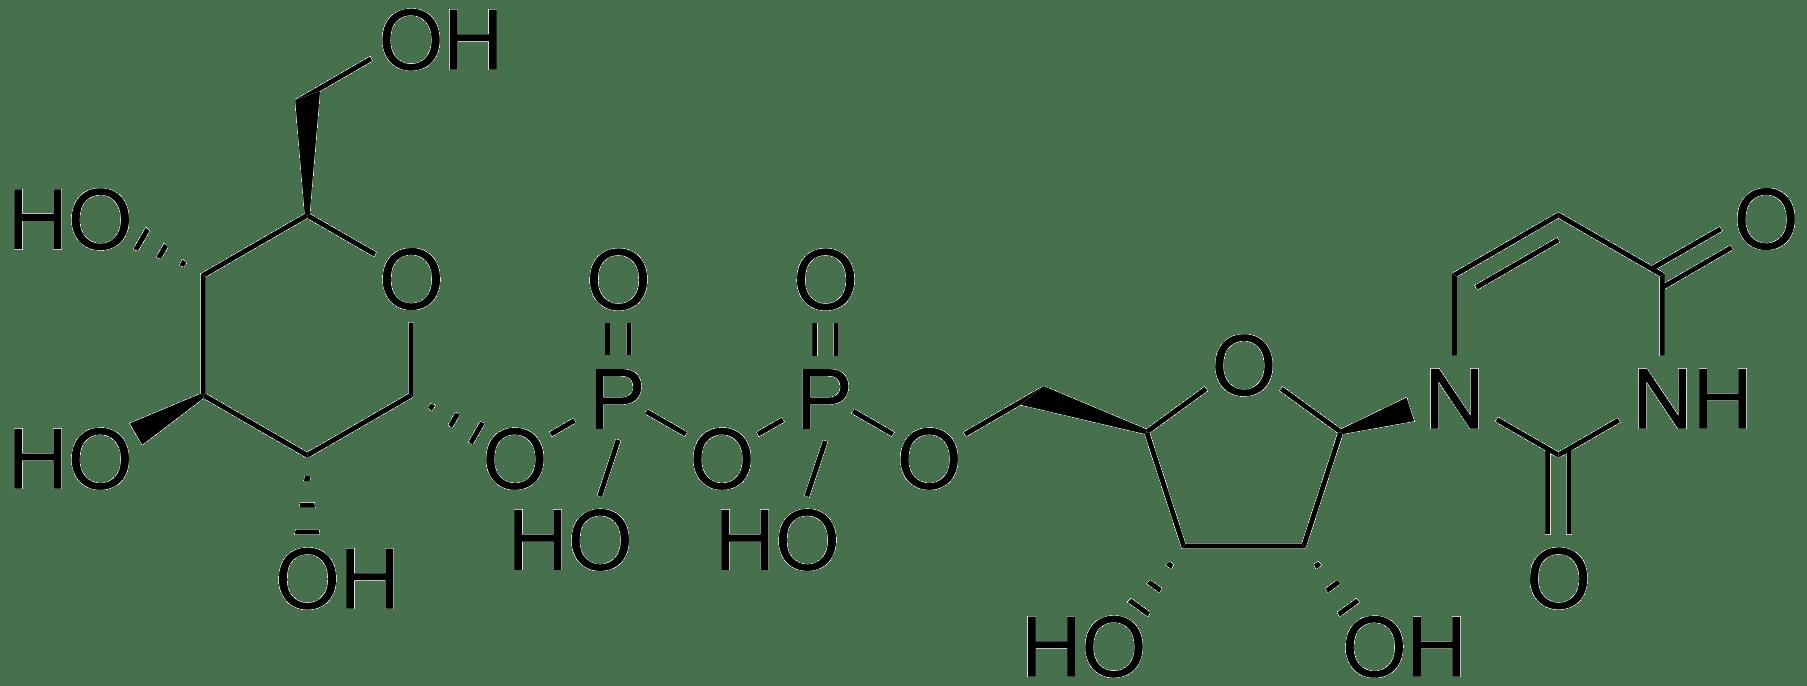 Uridine Diphosphate Glucose; UDP Glucose; UDPG; Uridine